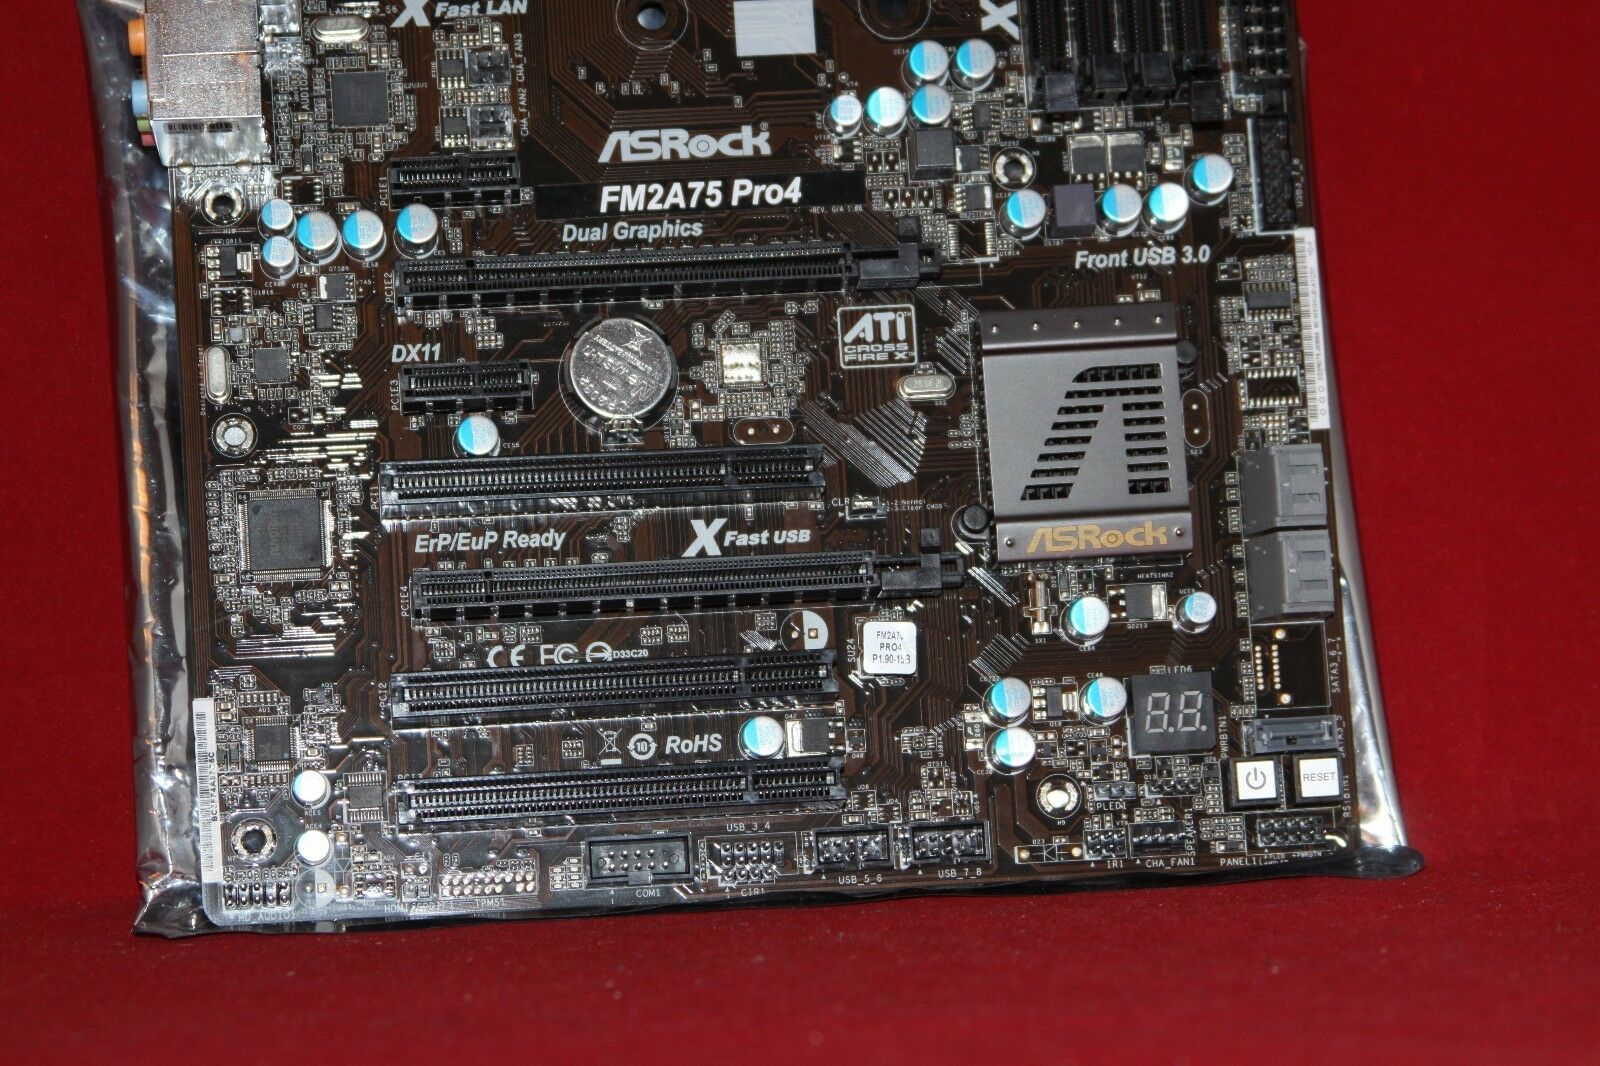 Asrock FM2A75 Pro4 AMD SATA RAID Windows 8 X64